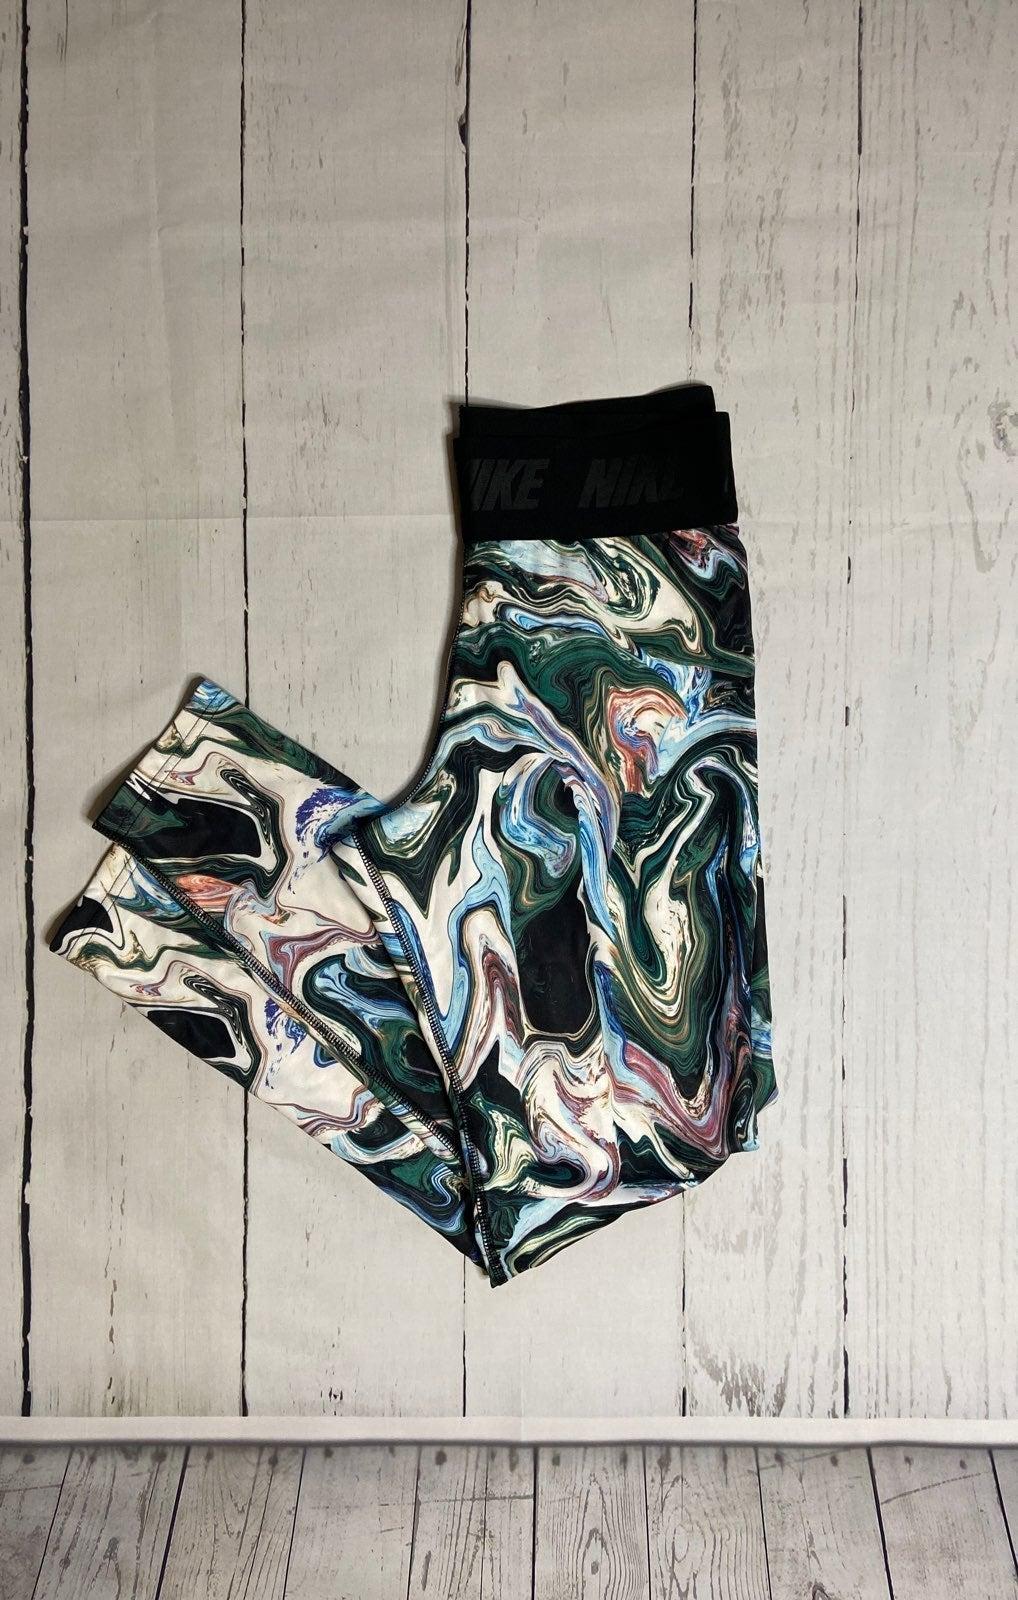 NIKE Marbled Workout Pants // Yoga Pants